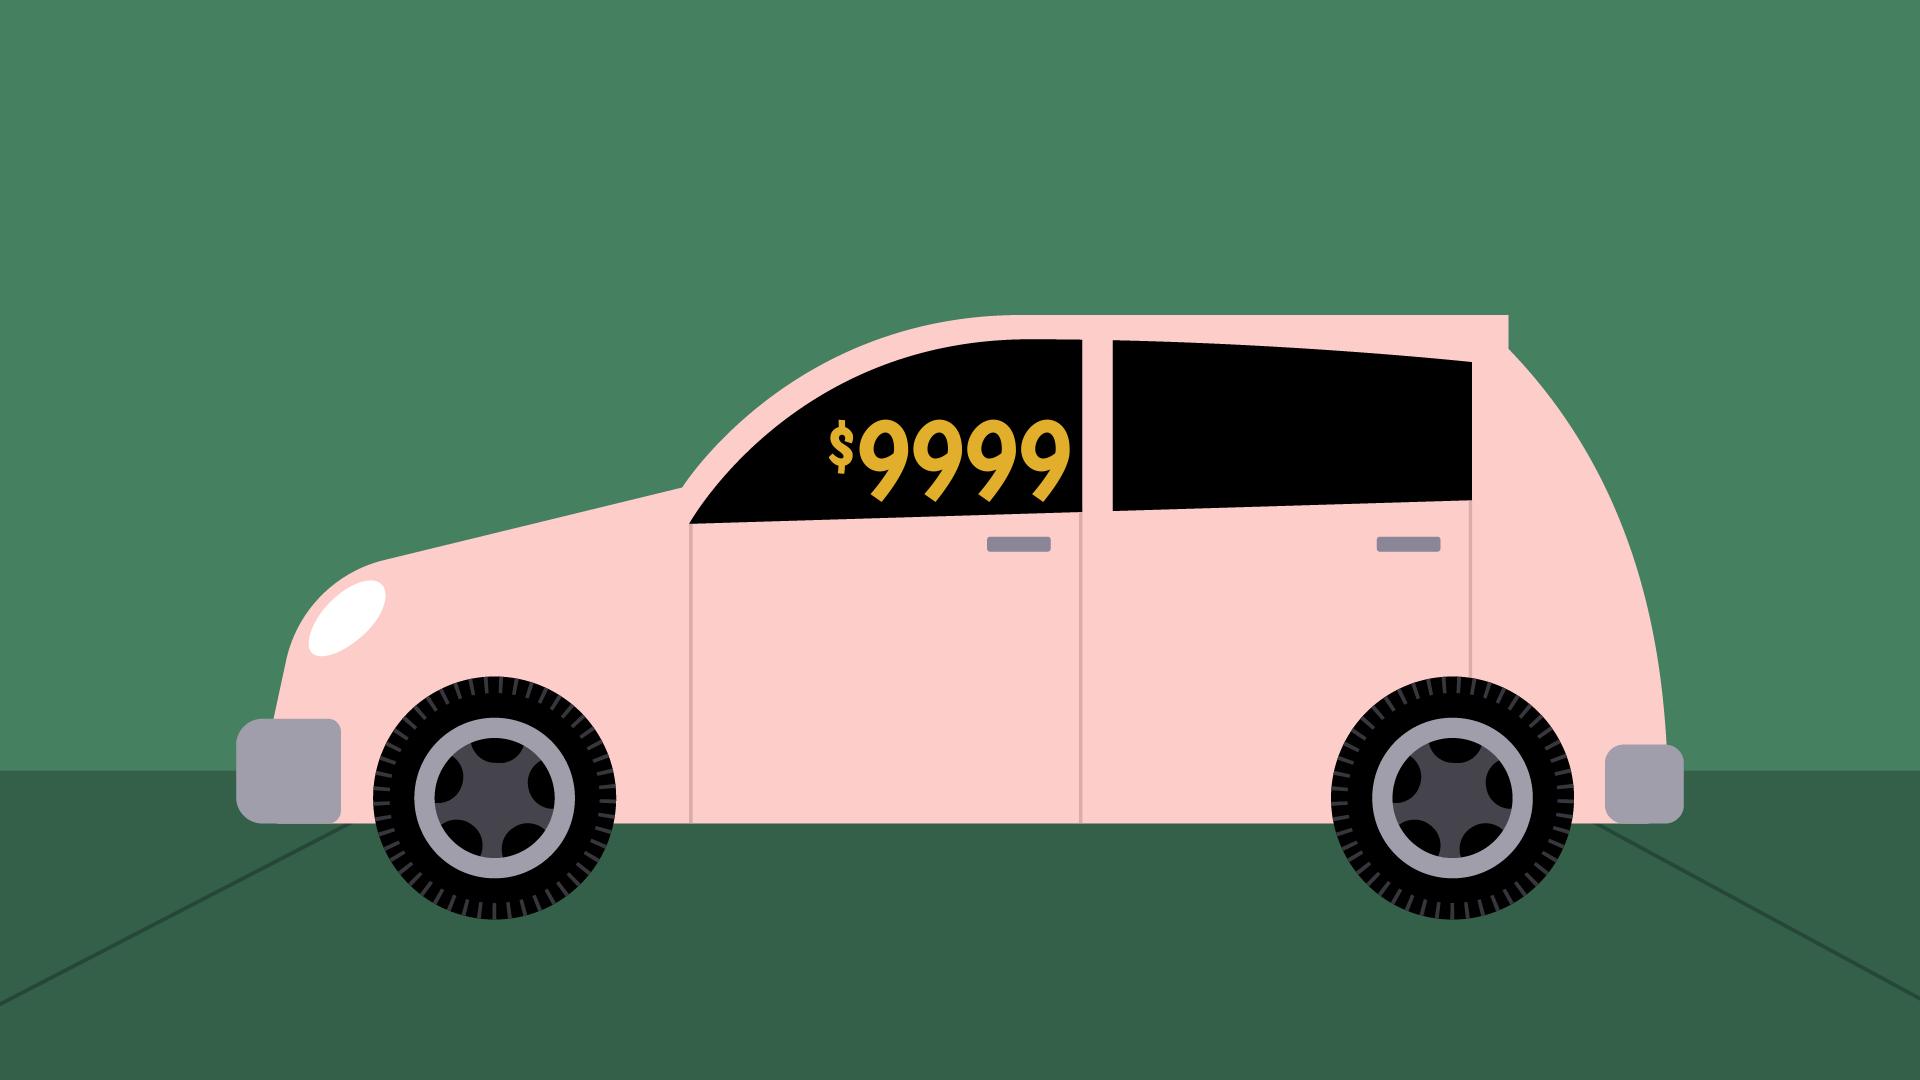 car $9999 price tag